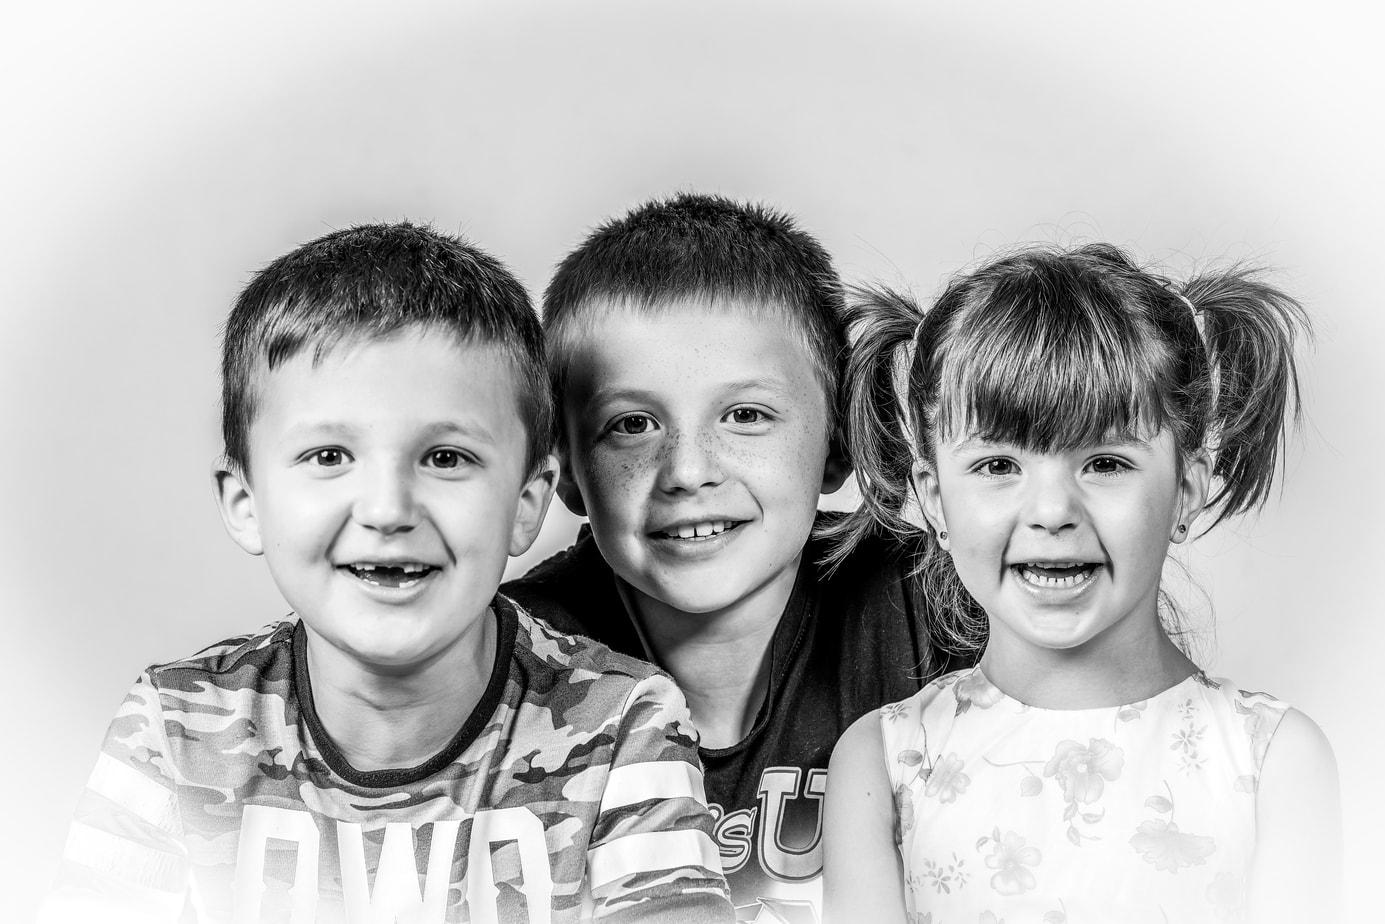 Familienfotos im Studio